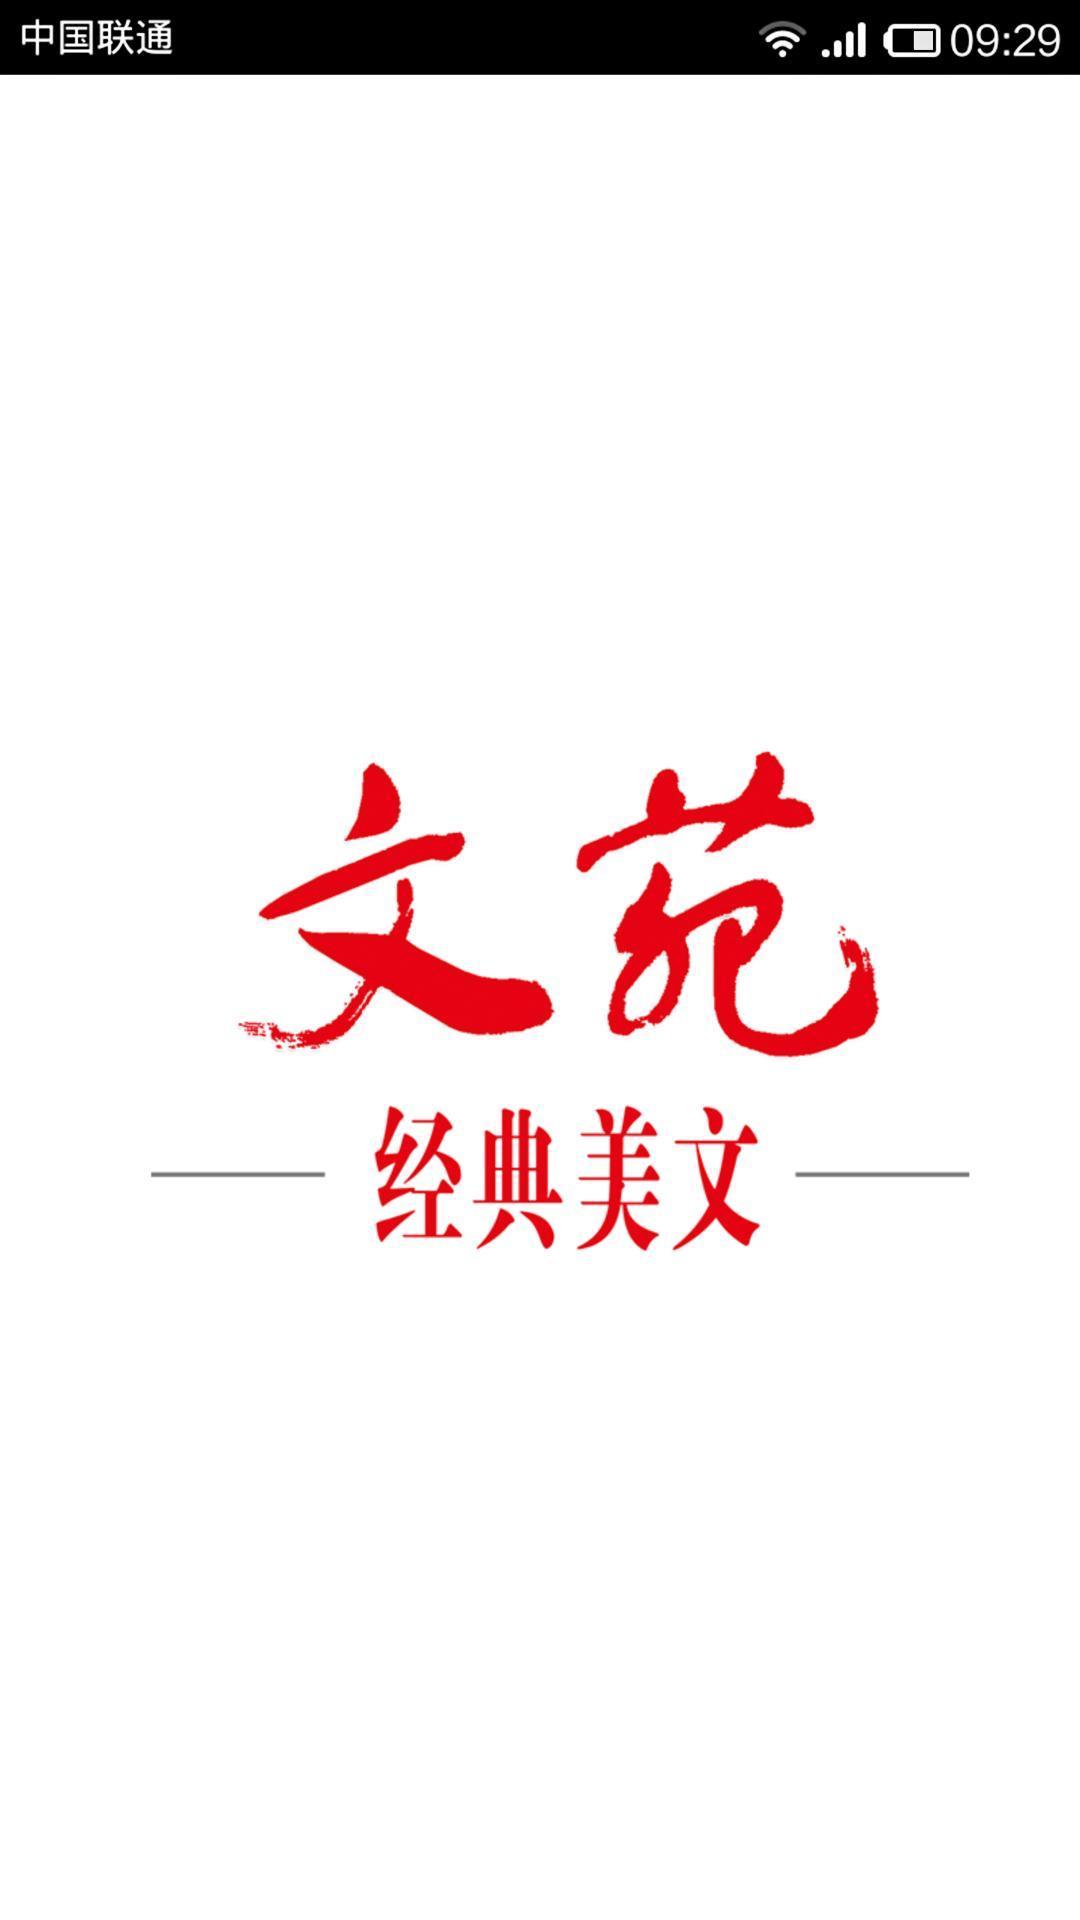 logo logo 标志 设计 矢量 矢量图 素材 图标 1080_1920 竖版 竖屏